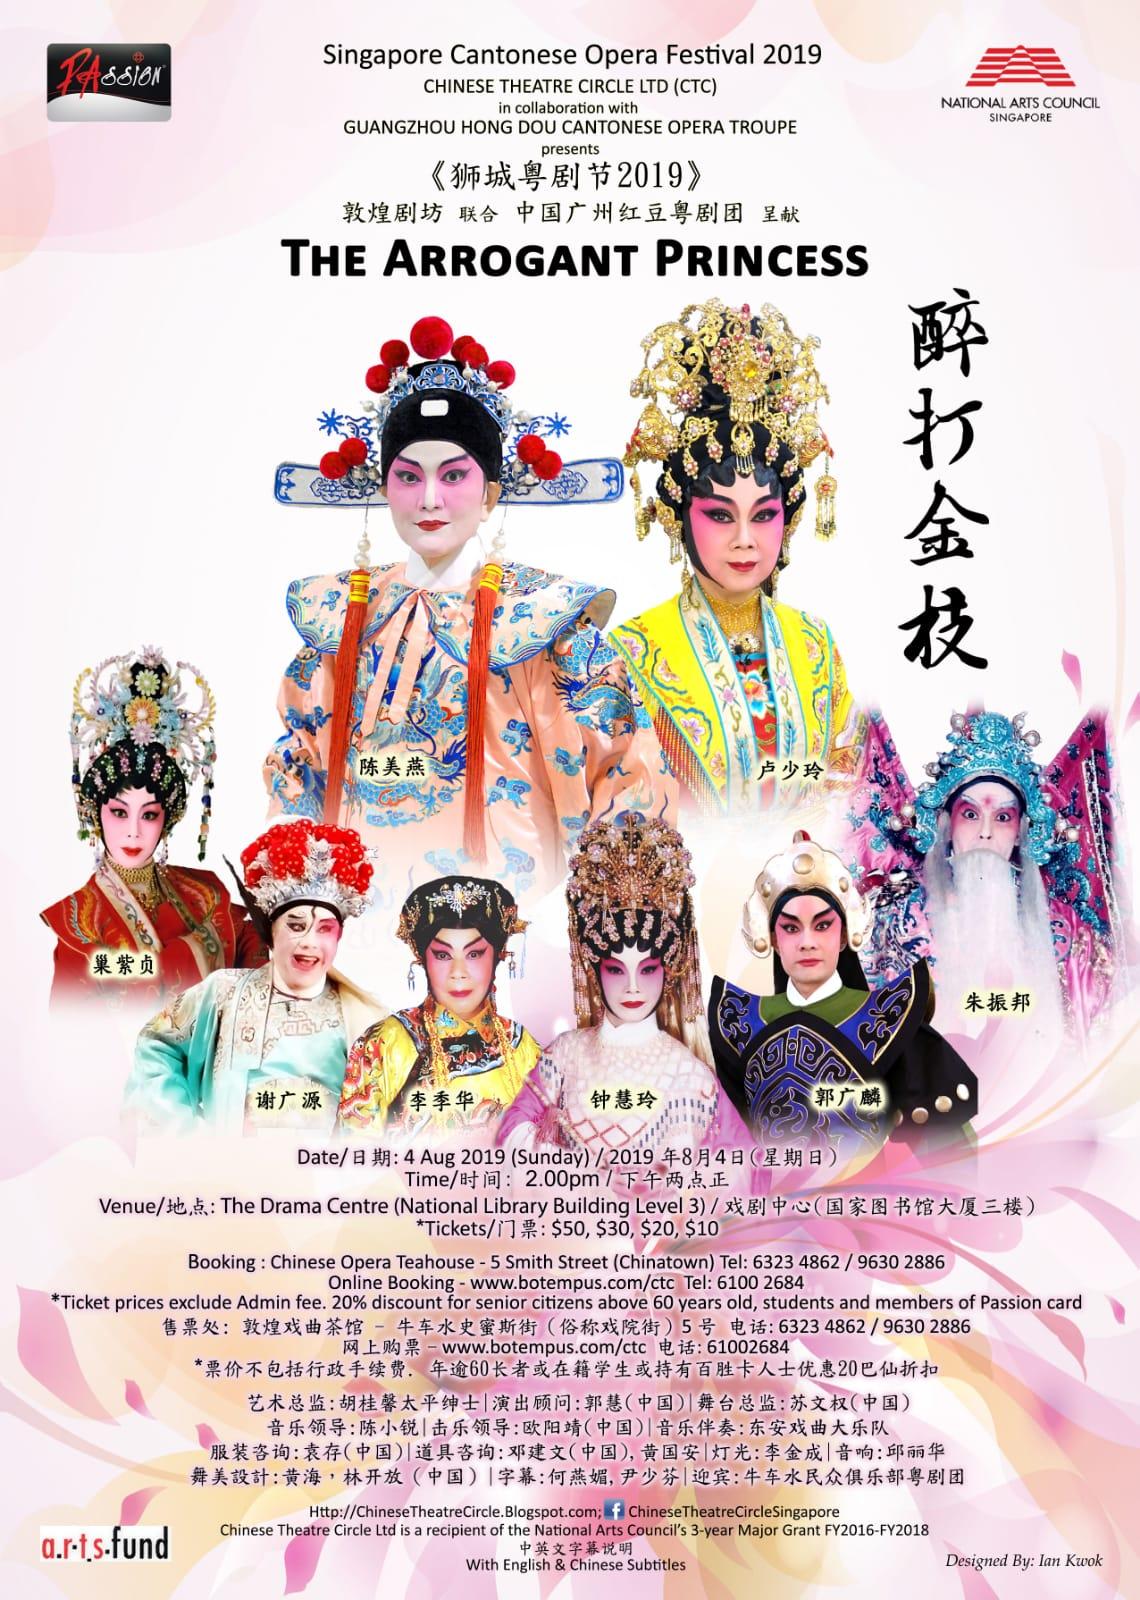 Chinese opera performances in Singapore